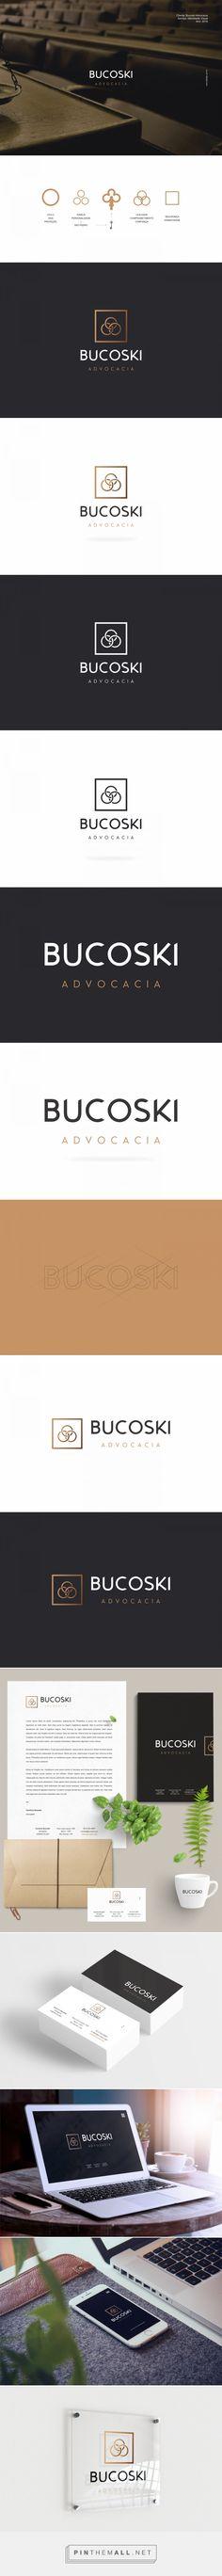 Bucoski Advocacia on Behance - created via https://pinthemall.net